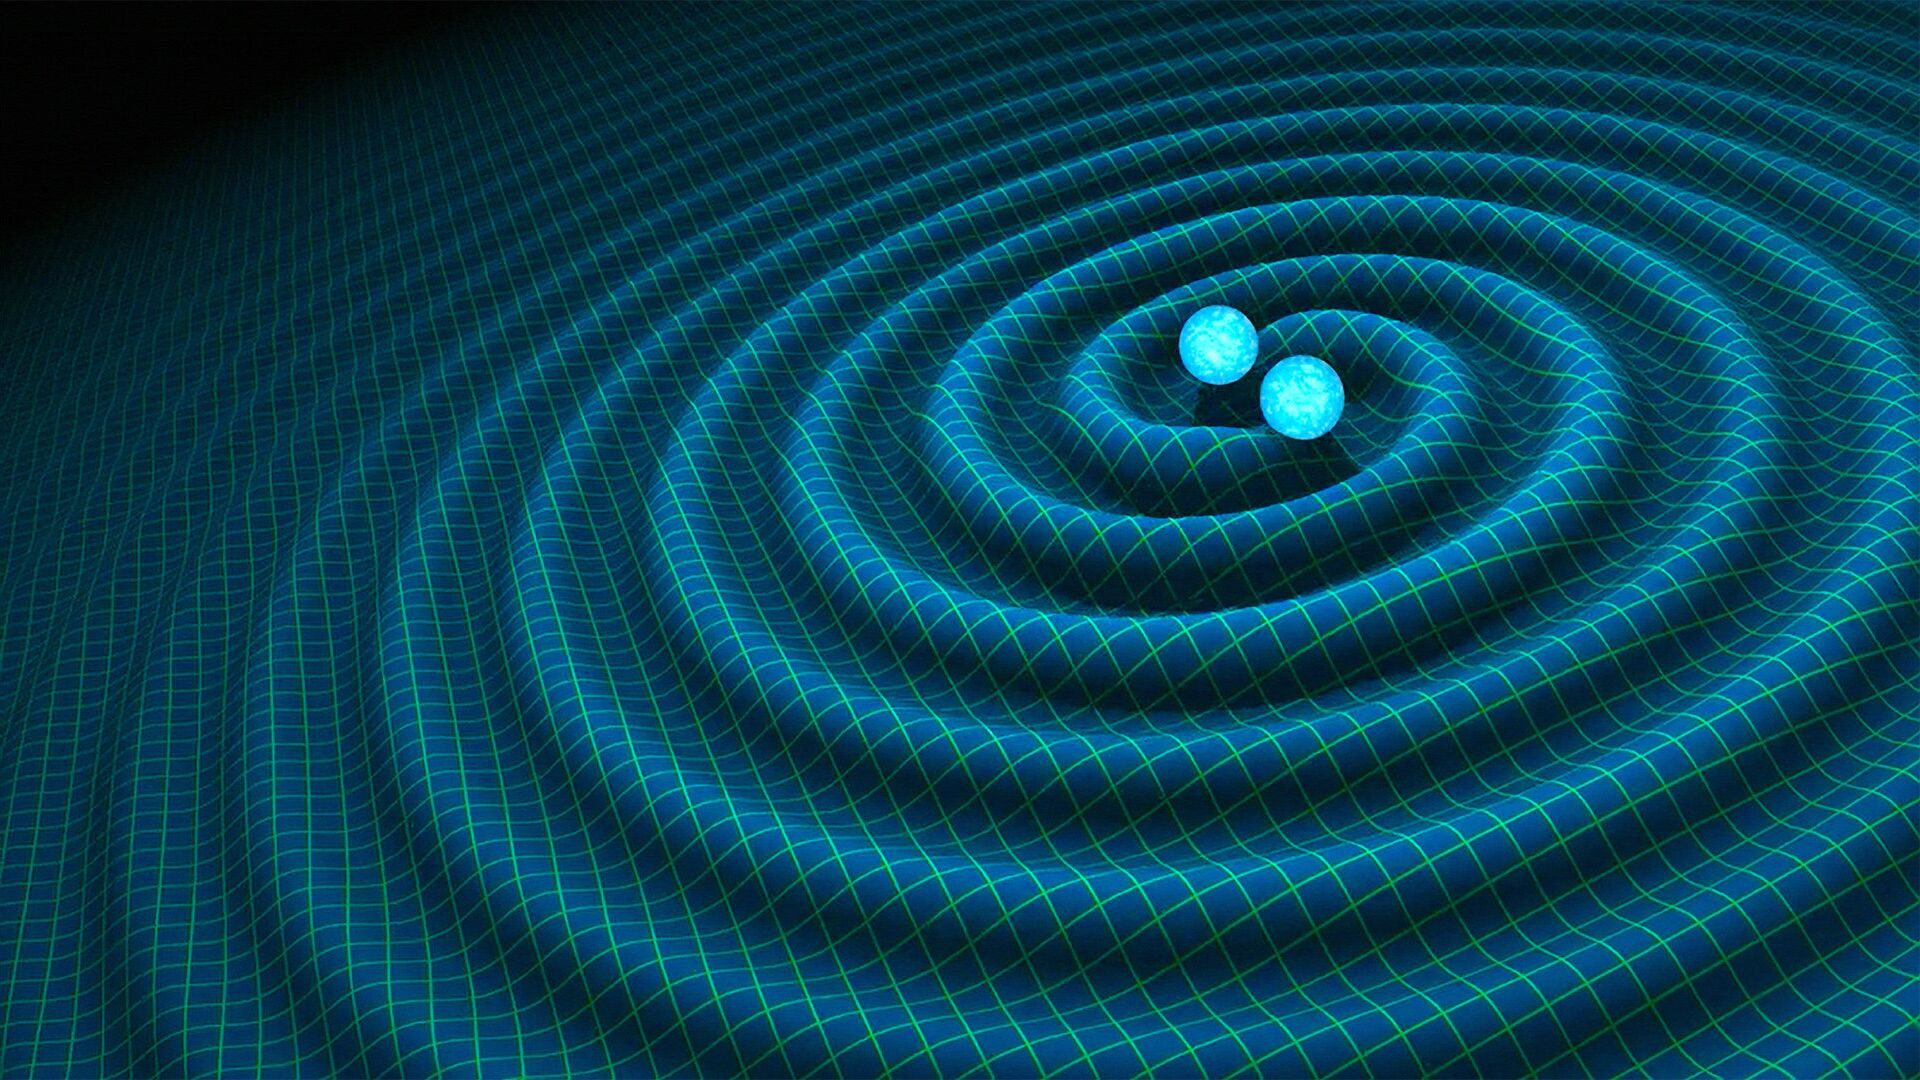 An artist's impression of gravitational waves generated by binary neutron stars - Sputnik International, 1920, 22.09.2021